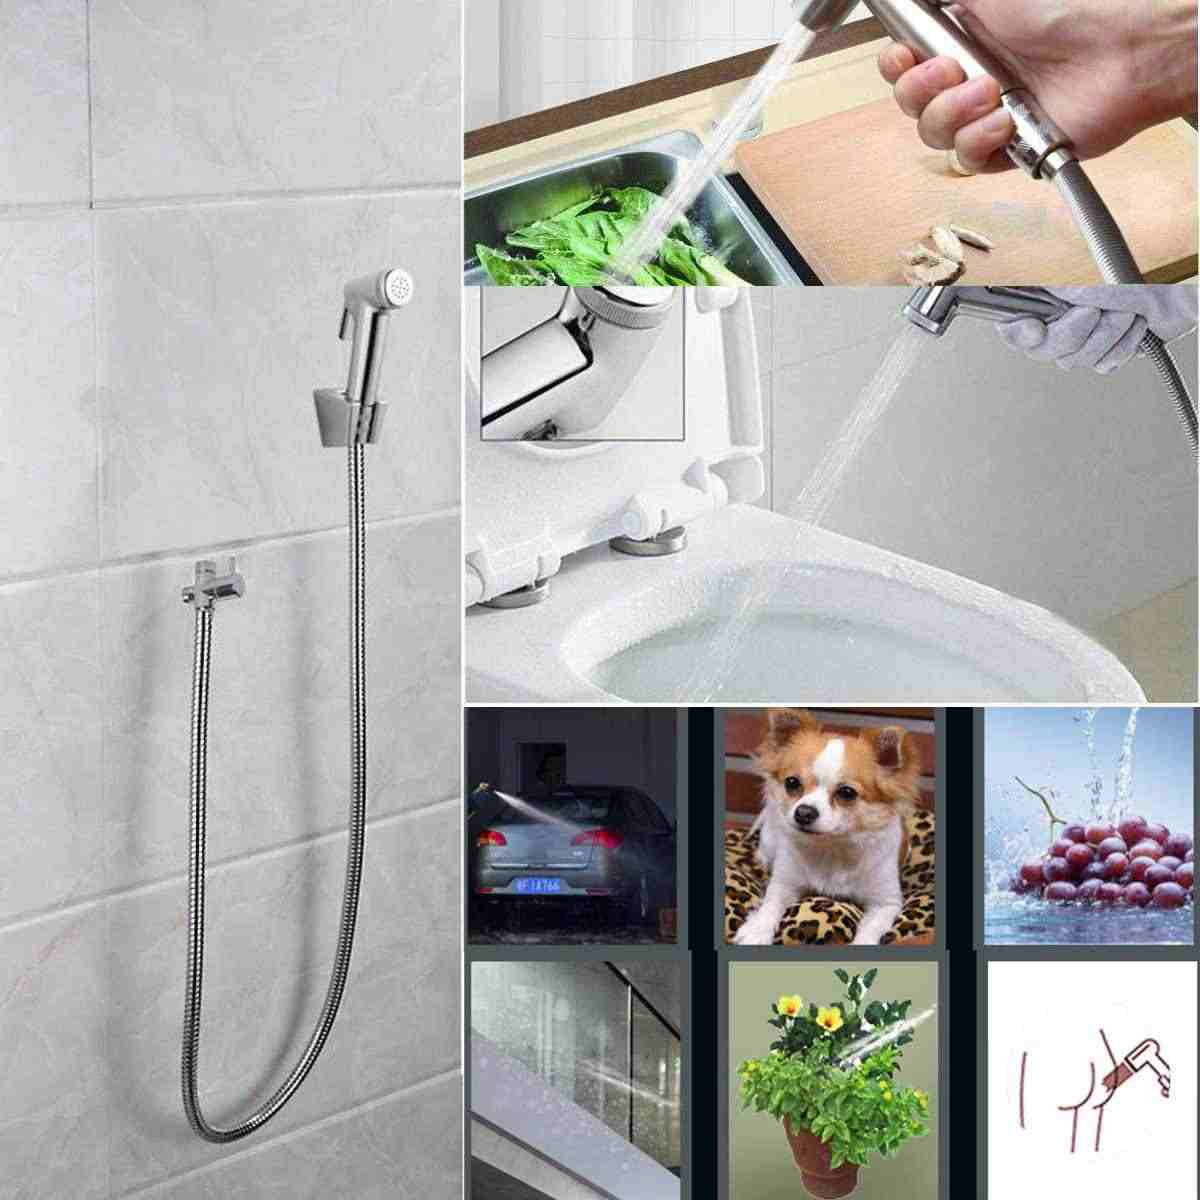 Stainless Steel Hand Held Shower Head Toilet Bidet Sprayer Tap Set Portable Washer Jet Guns Seat Bidet Handheld Hygienic Spray